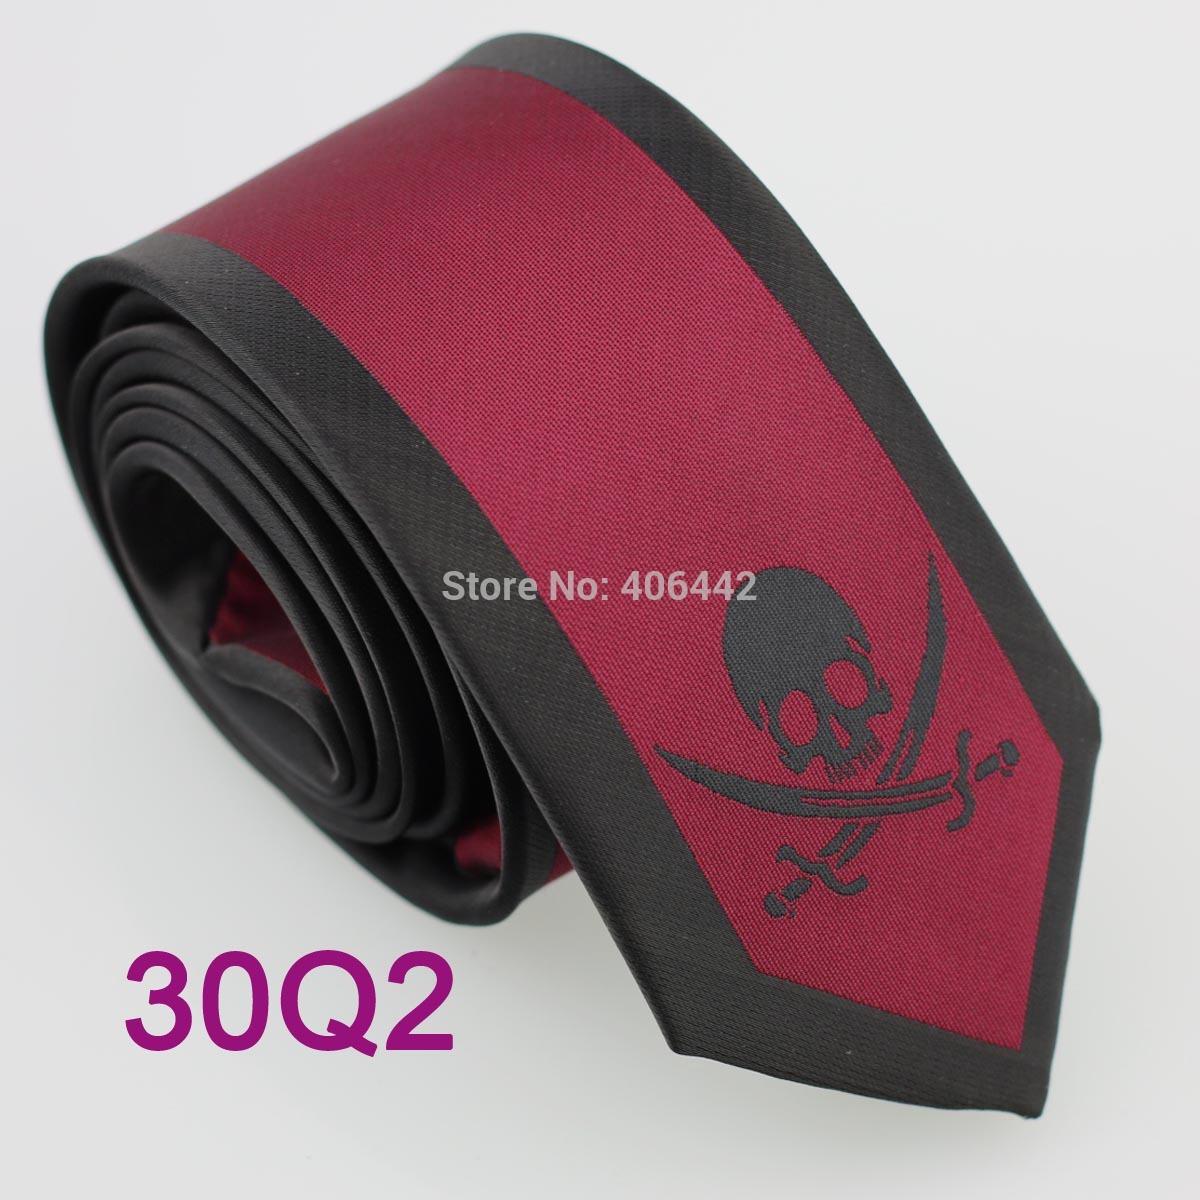 Женские воротнички и галстуки Yibei Coachella Gravata 30Q2